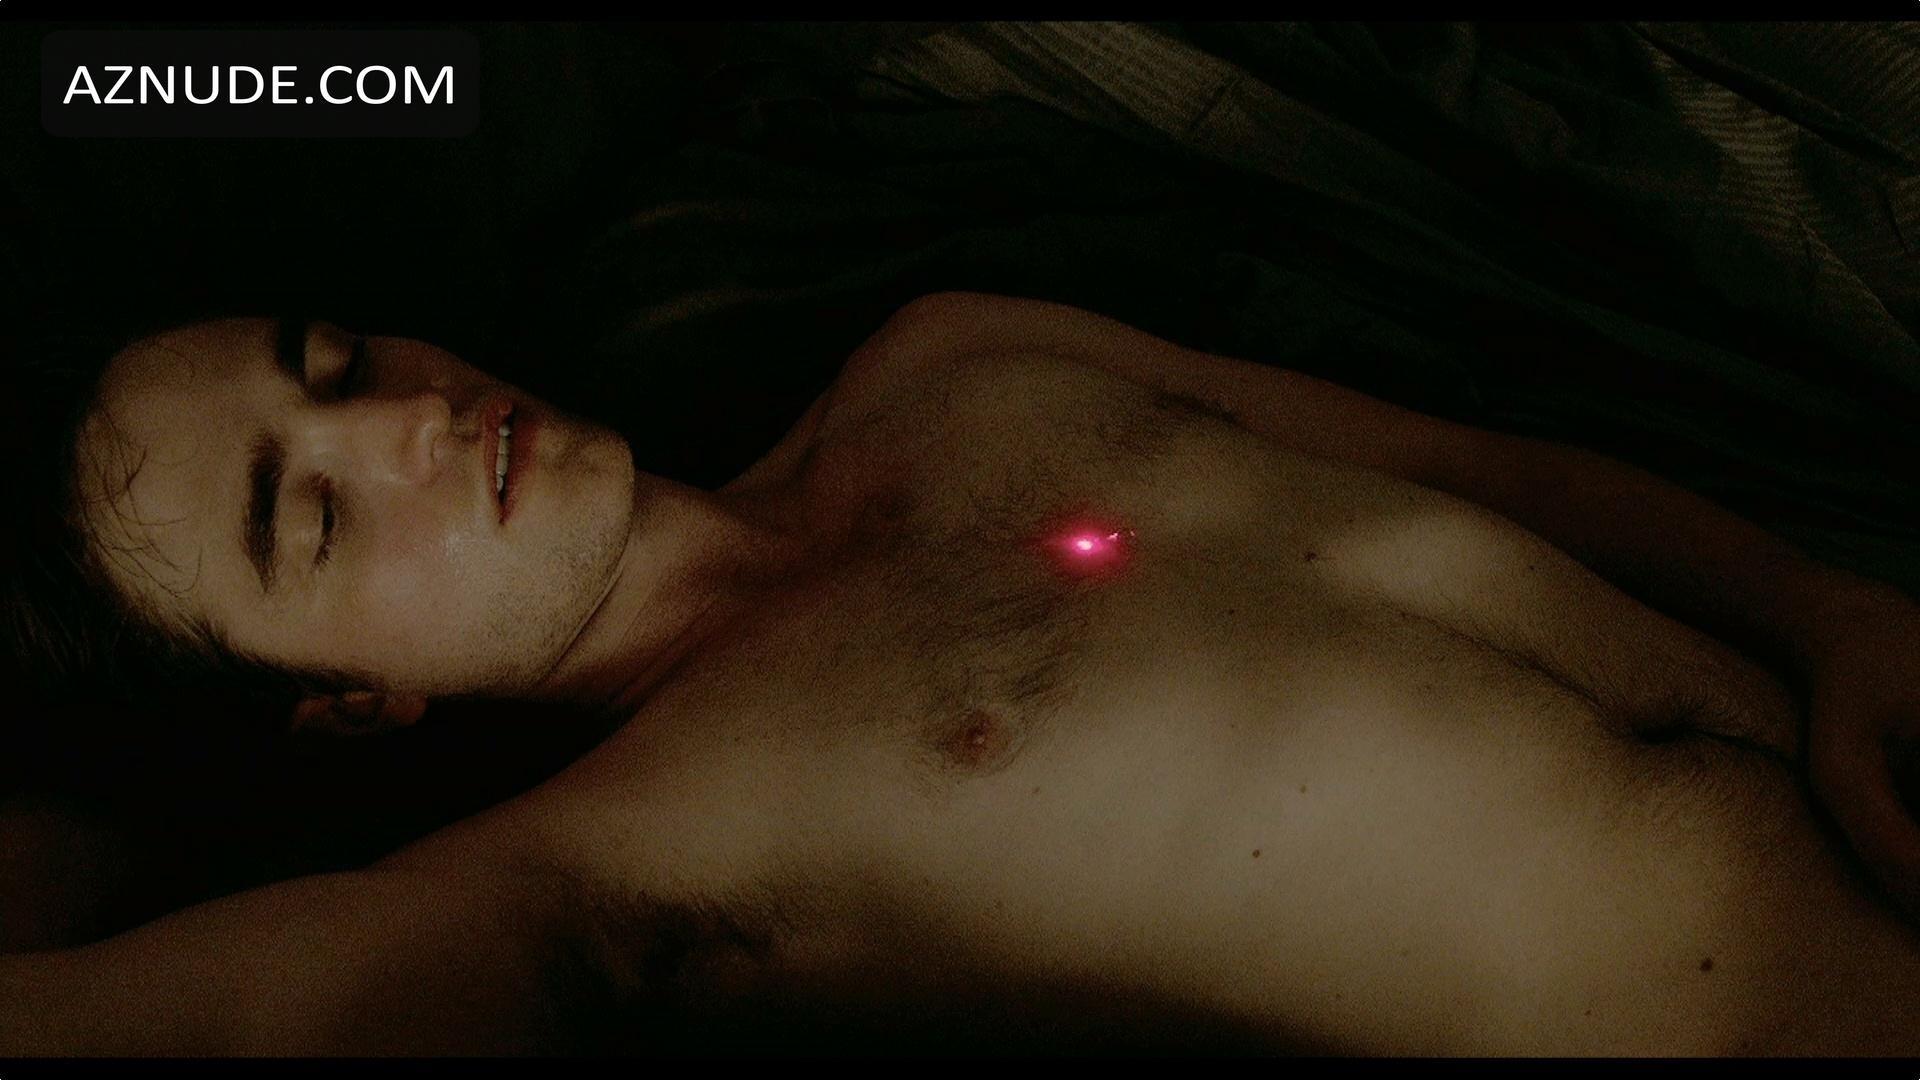 Robert Pattinson Is Sick Of Having To Masturbate In Images